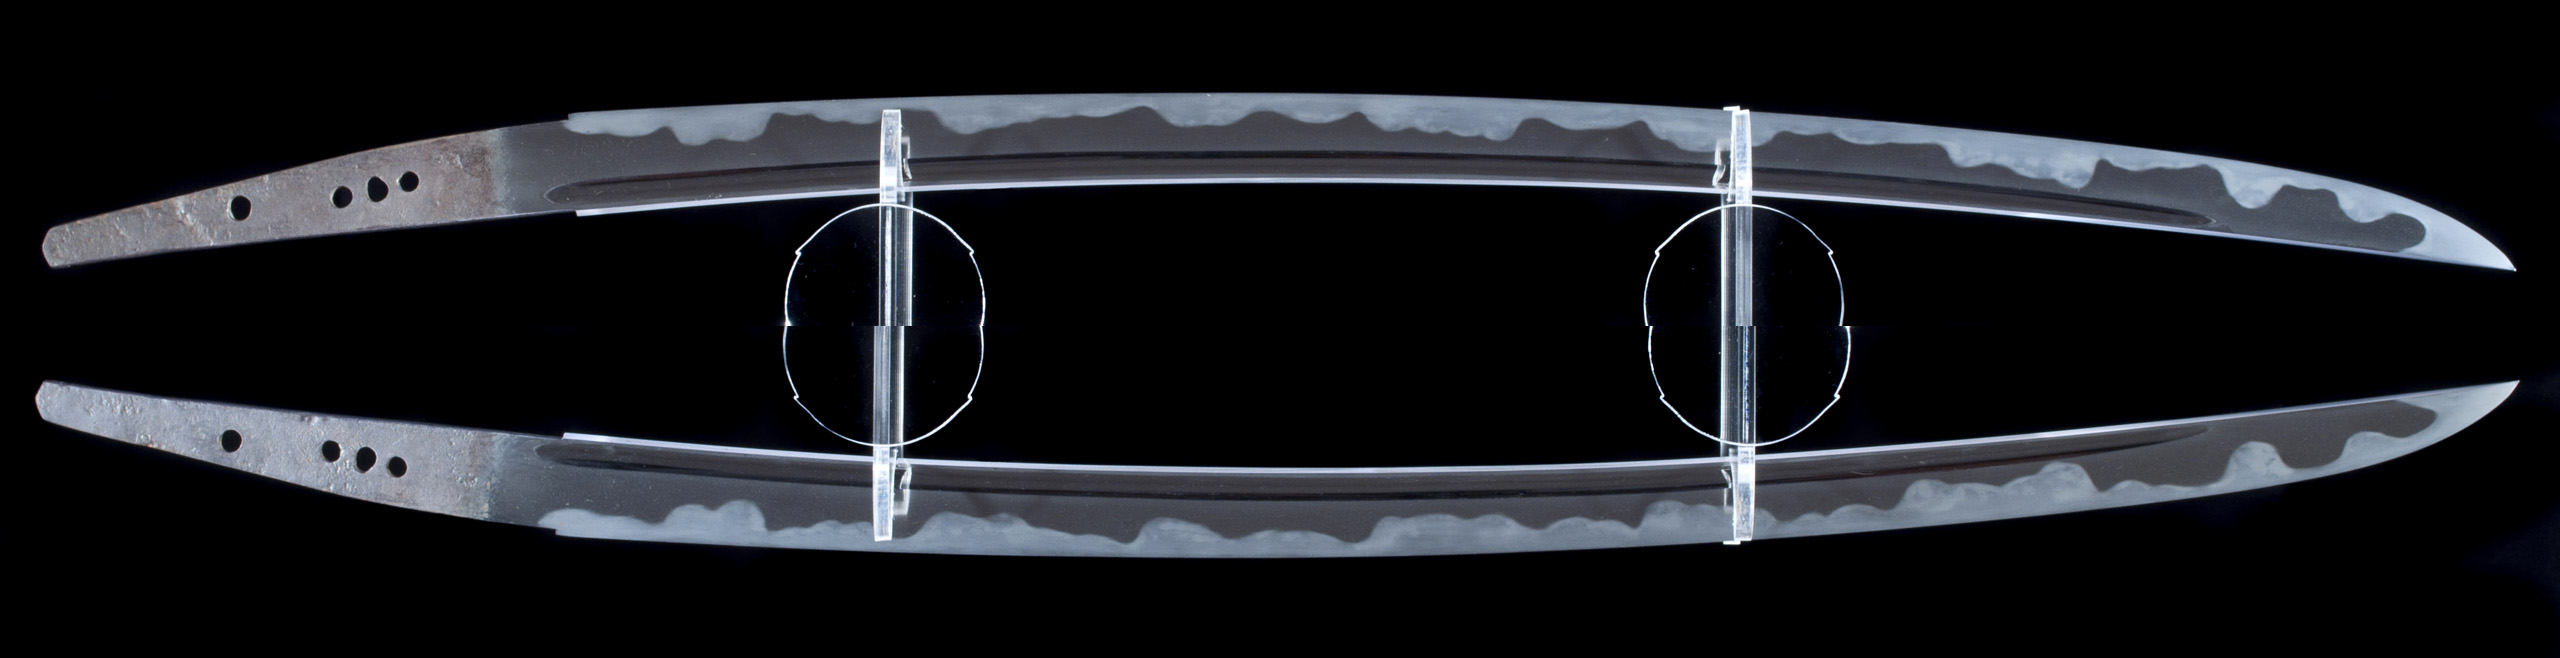 Muramasa Sengo Katana sabre japonais (1)